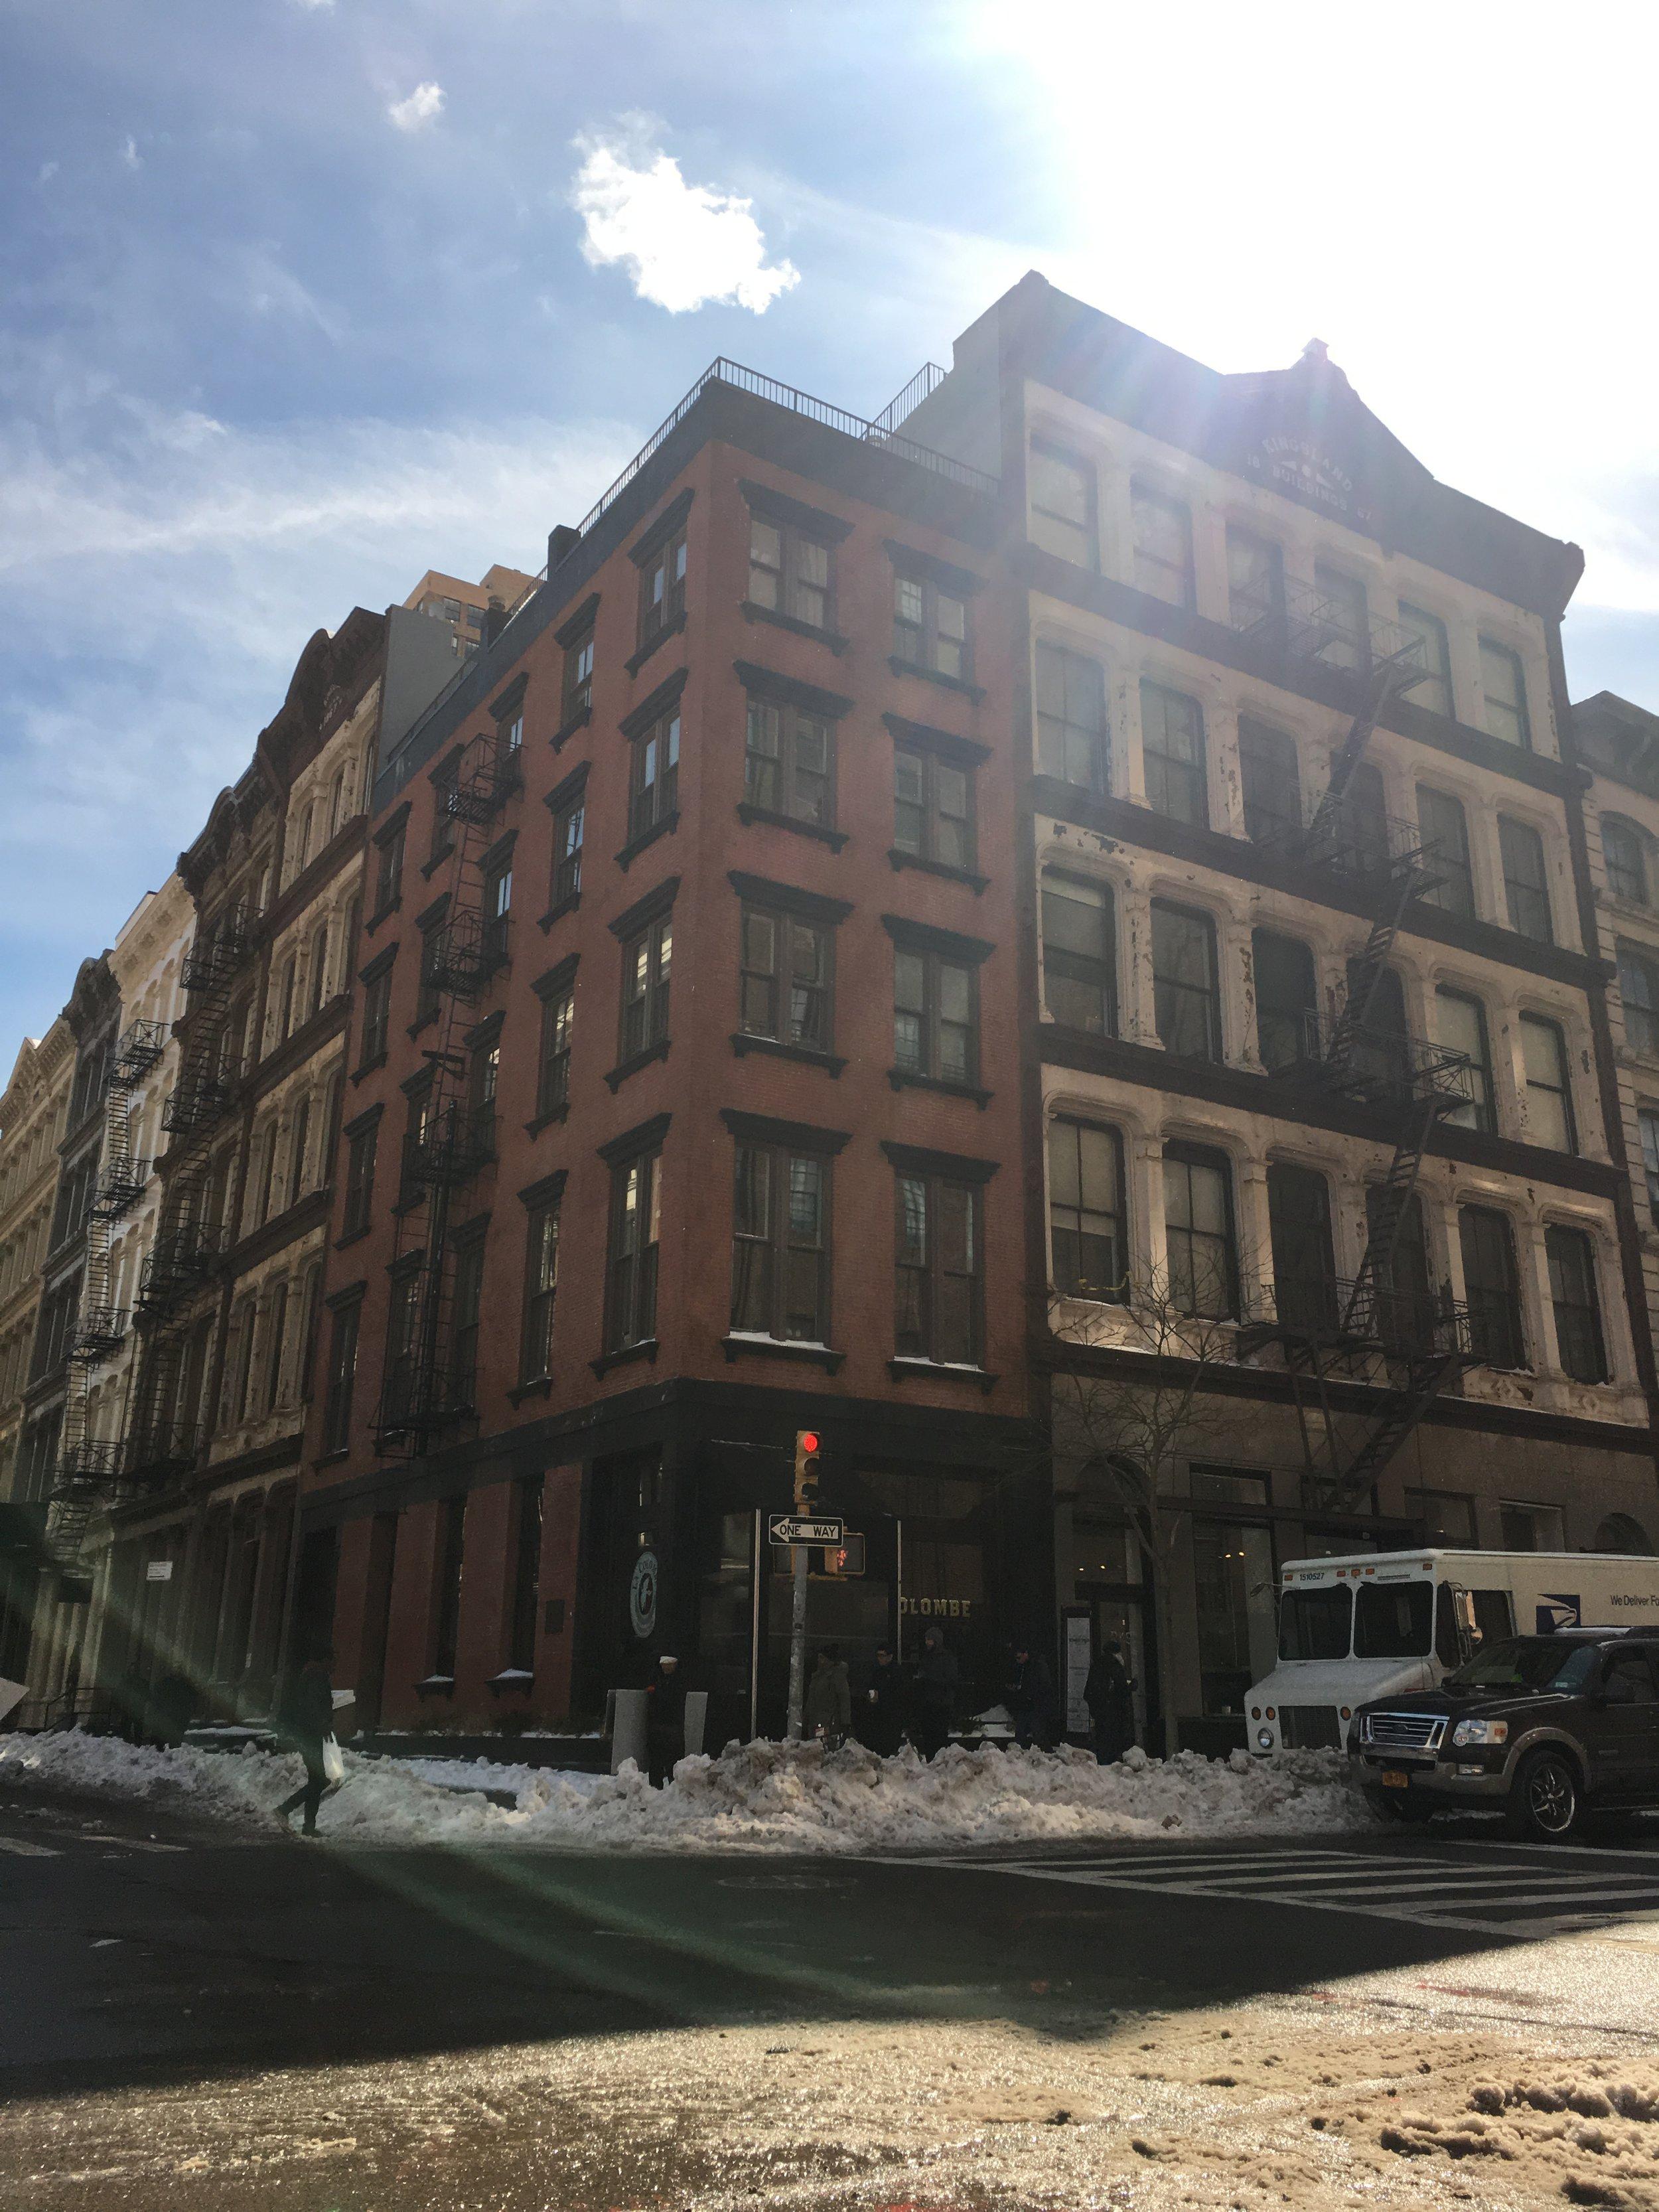 319 Church Street - Architect:Gianni Intili5 story mixed use building